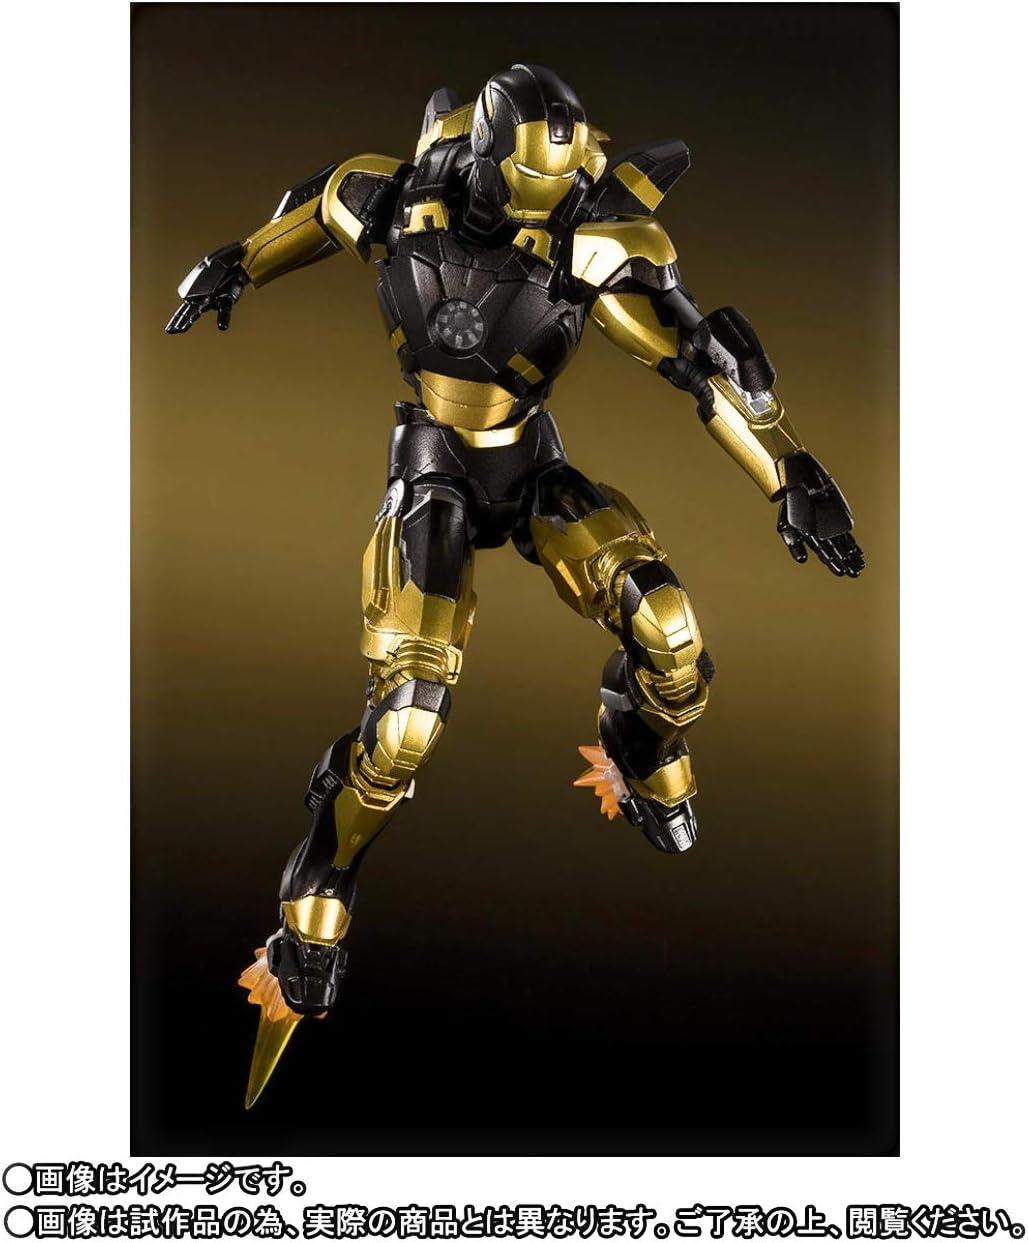 BANDAI Premium S.H.Figuarts Iron Man MK-XX Python Action Figure